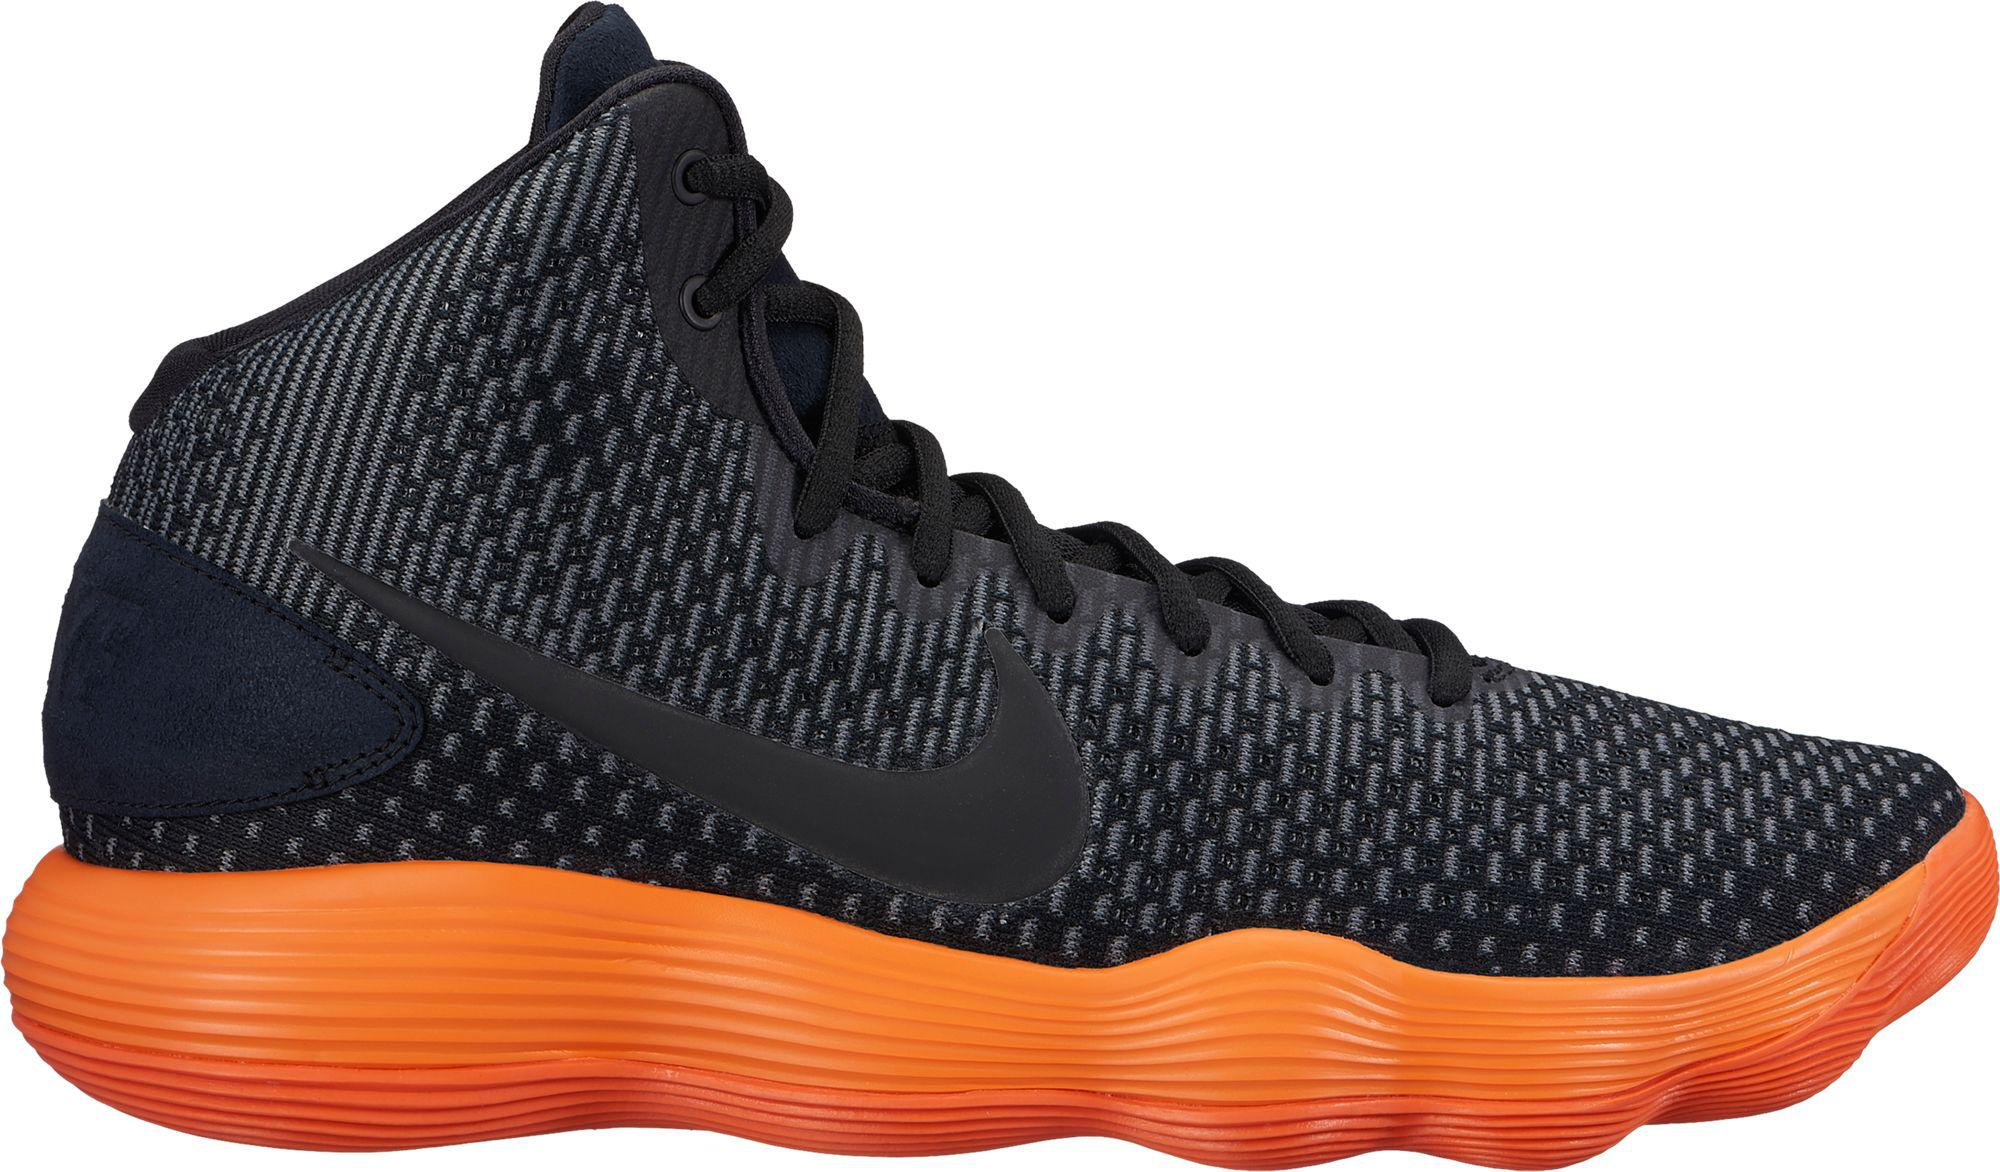 15d105630767 Lyst - Nike React Hyperdunk 2017 Basketball Shoes in Orange for Men